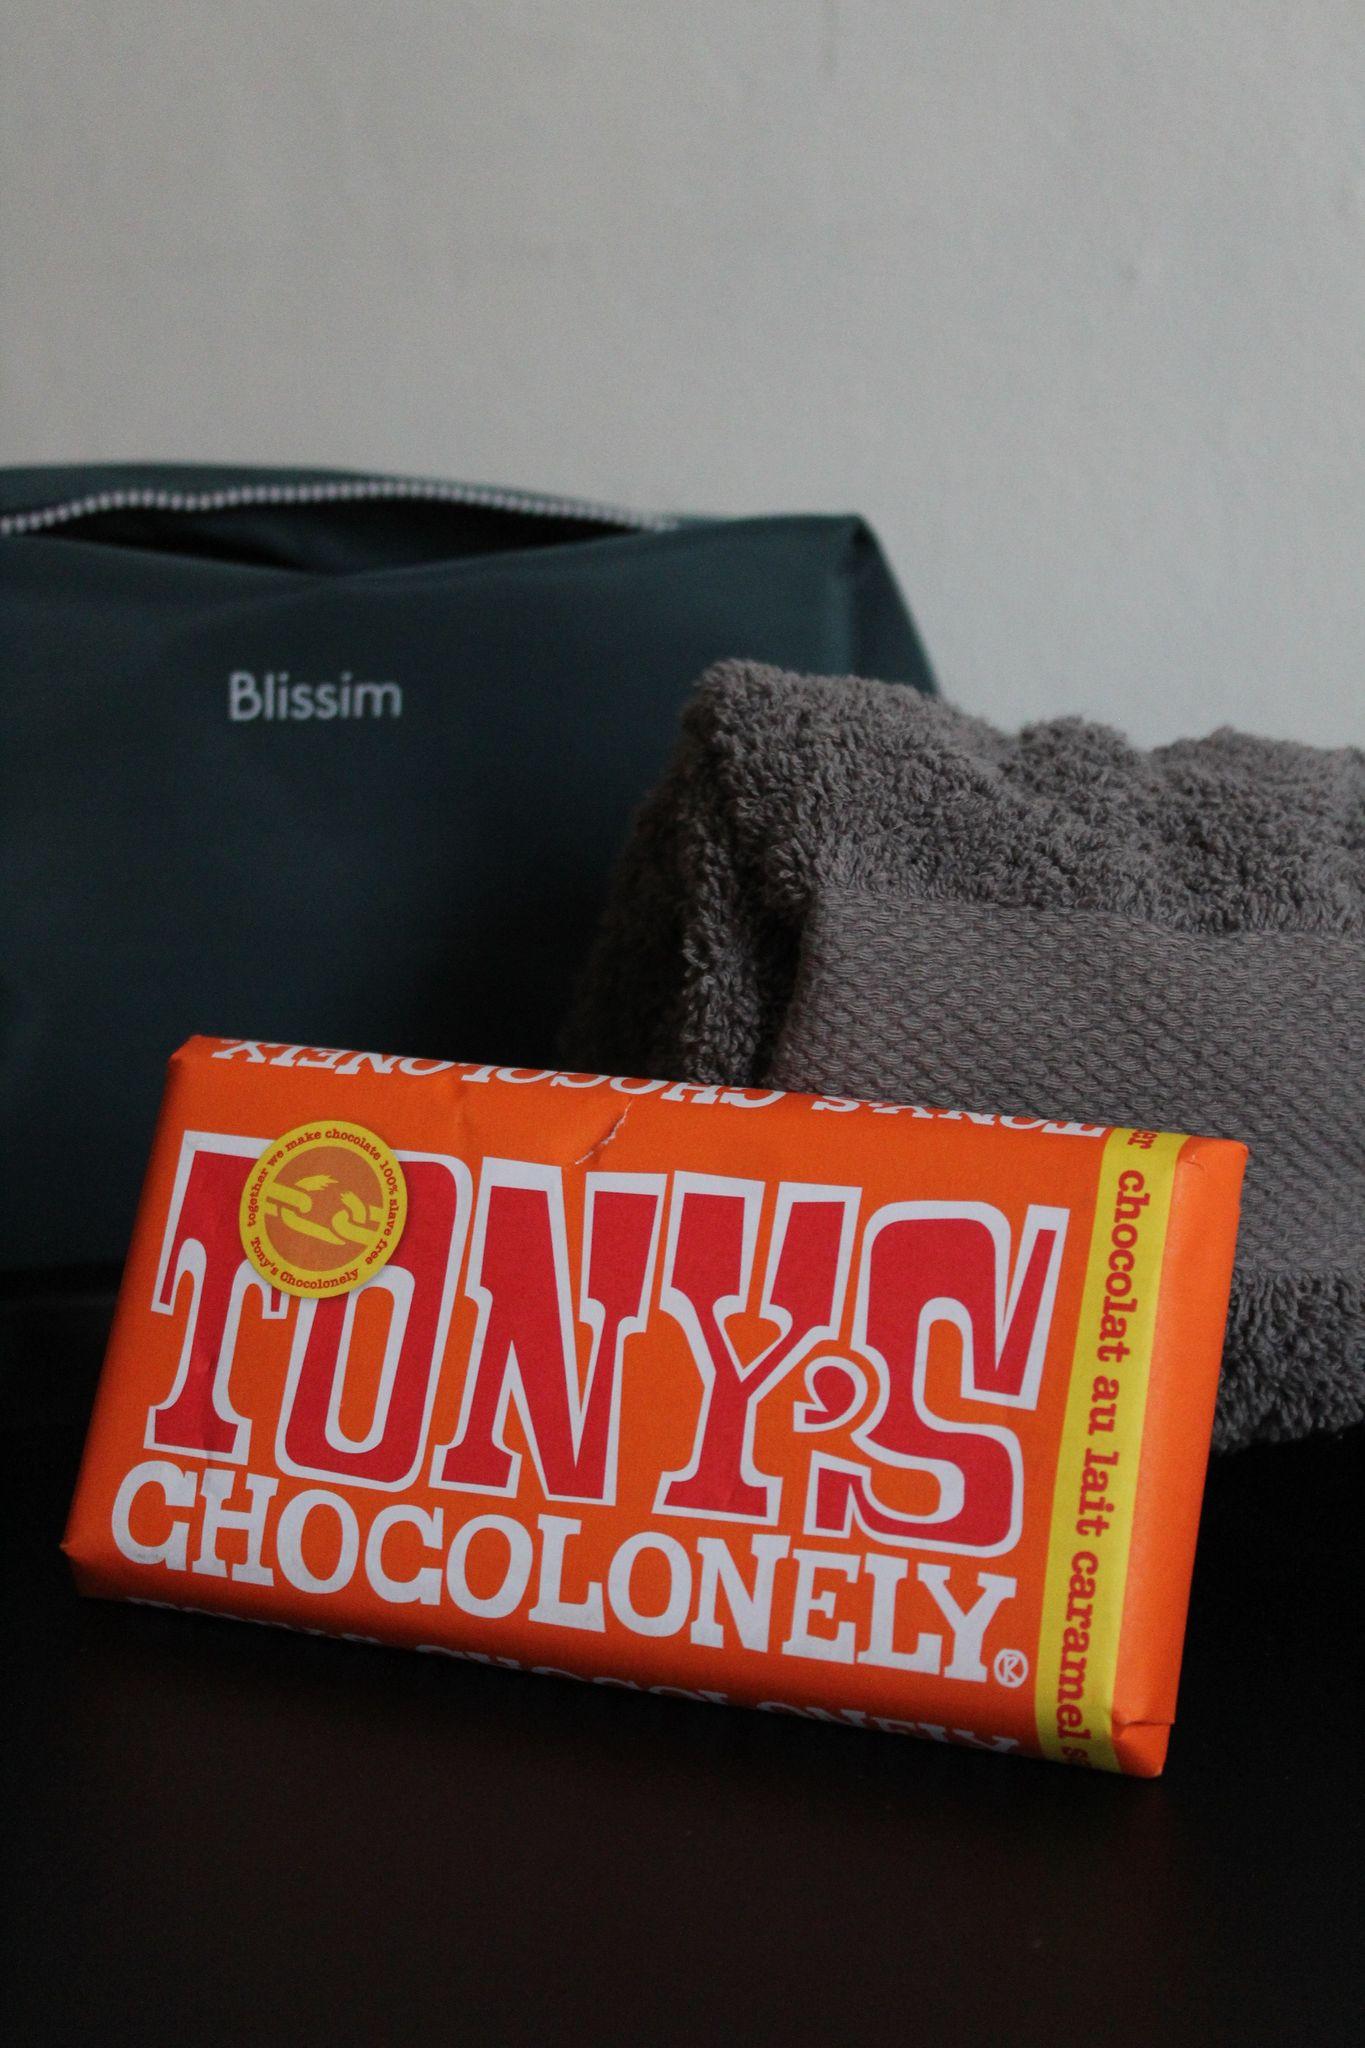 tablette de chocolat caramel Tony's Chocolonely